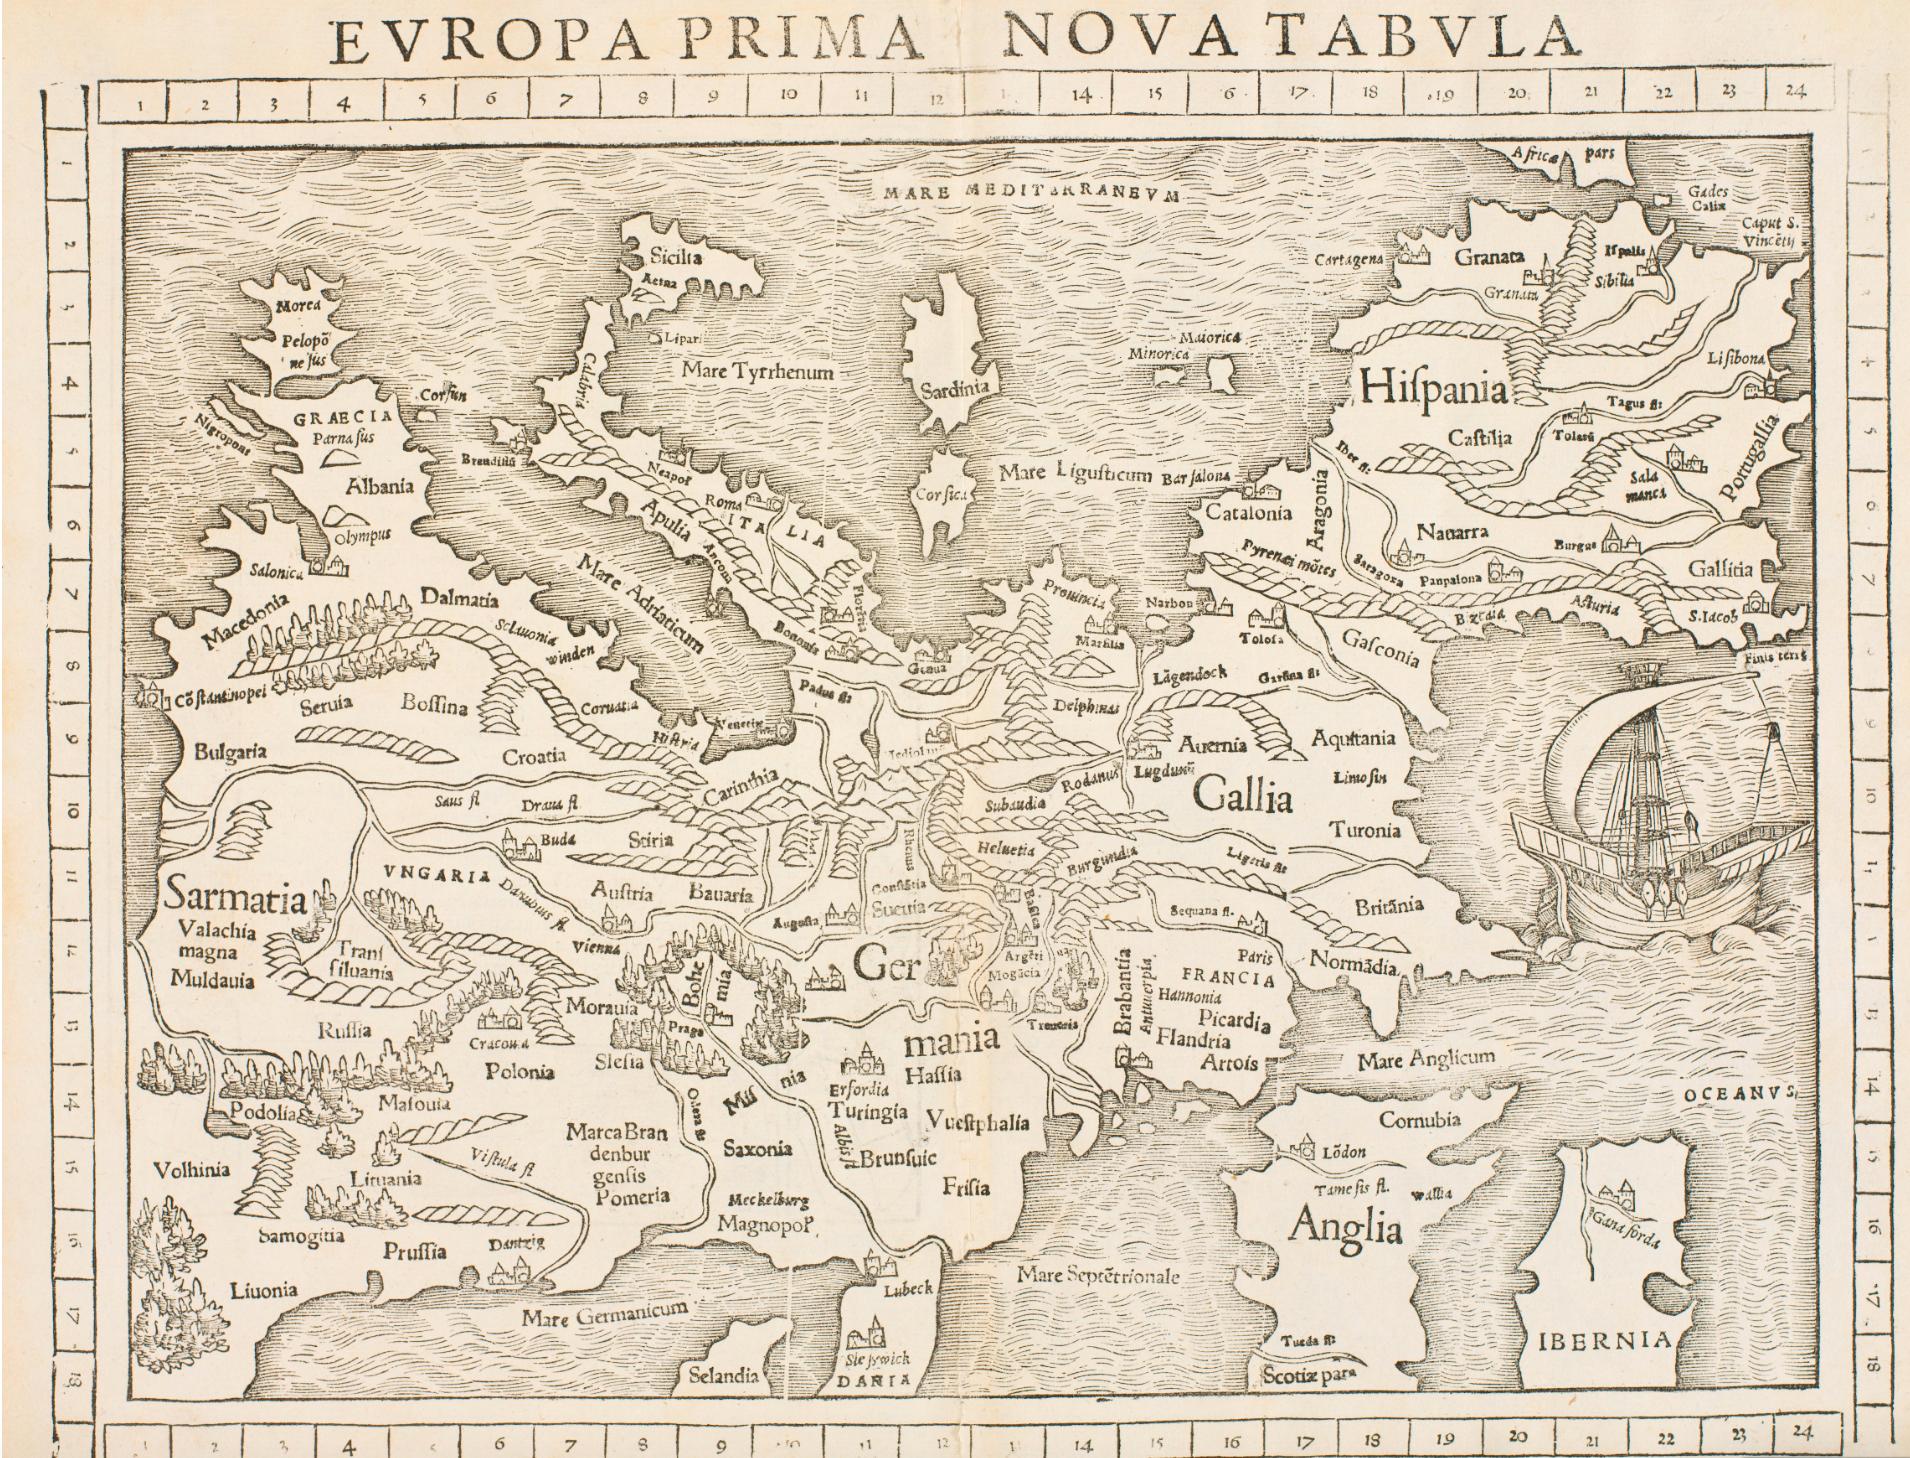 EUROPA PRIMA NOVA Cosmographia.png